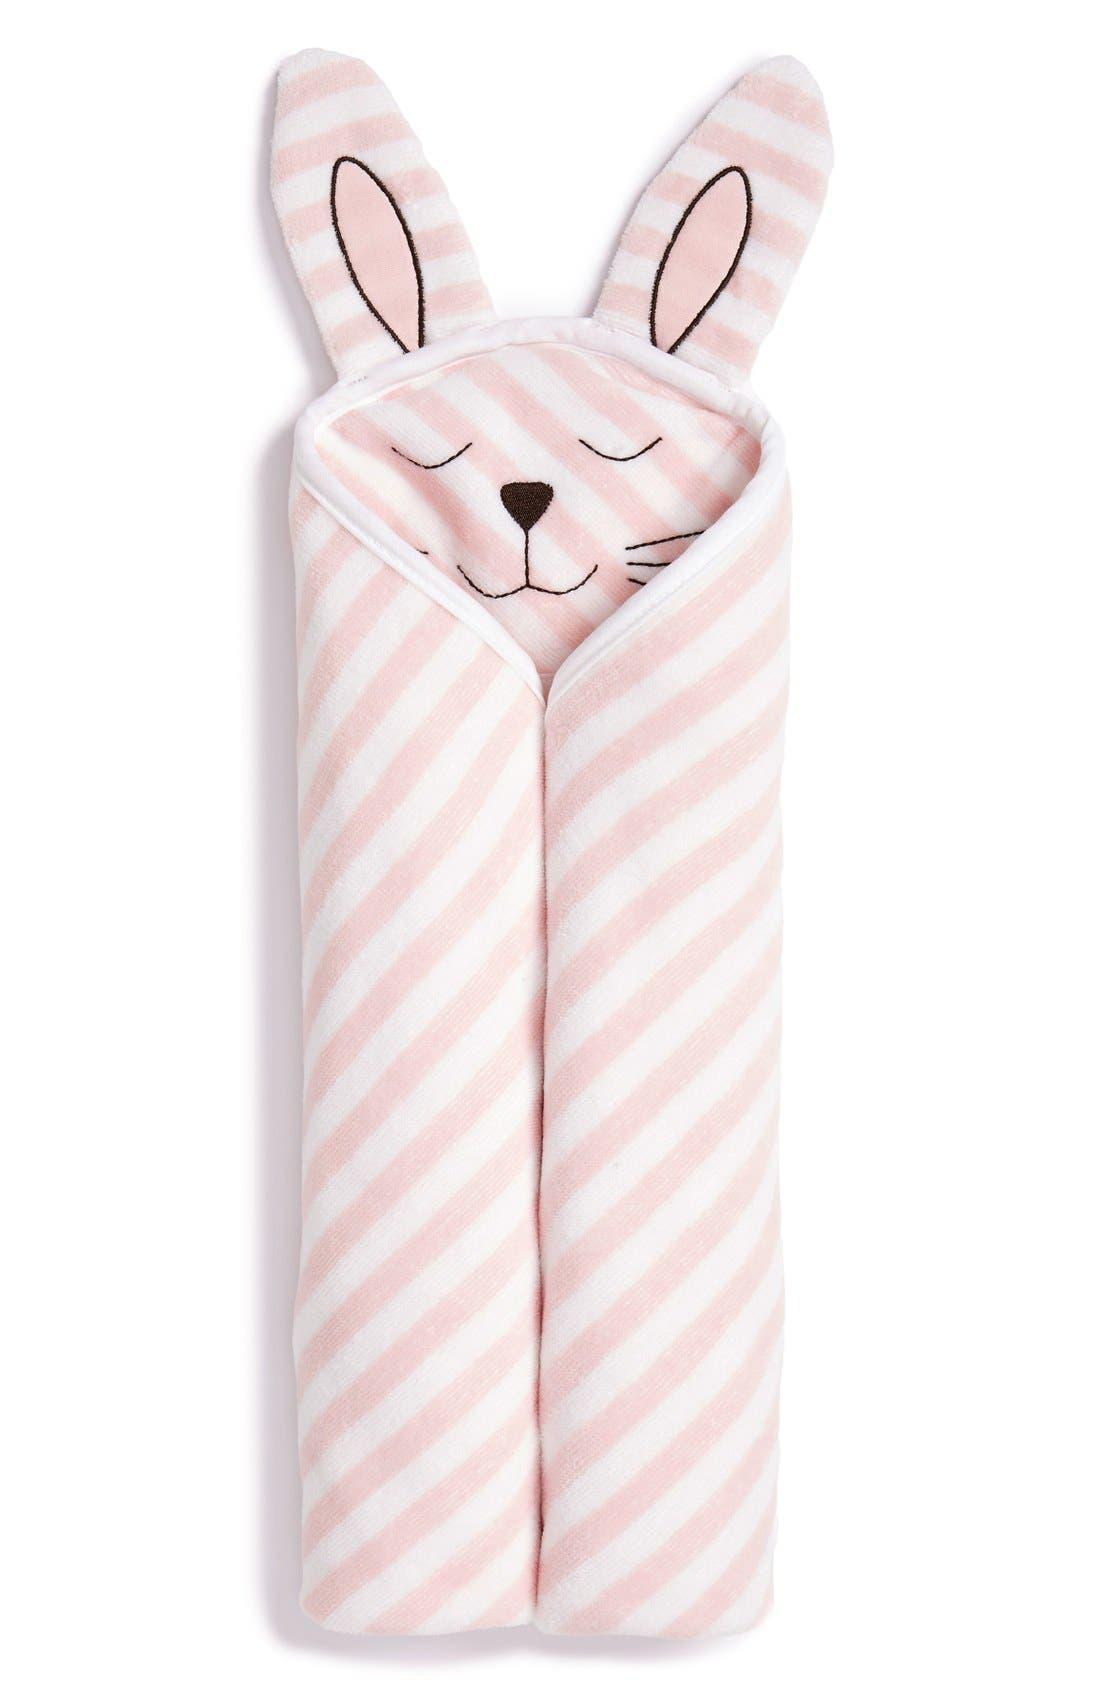 Hooded Animal Towel,                             Main thumbnail 1, color,                             PINK BABY BUNNY